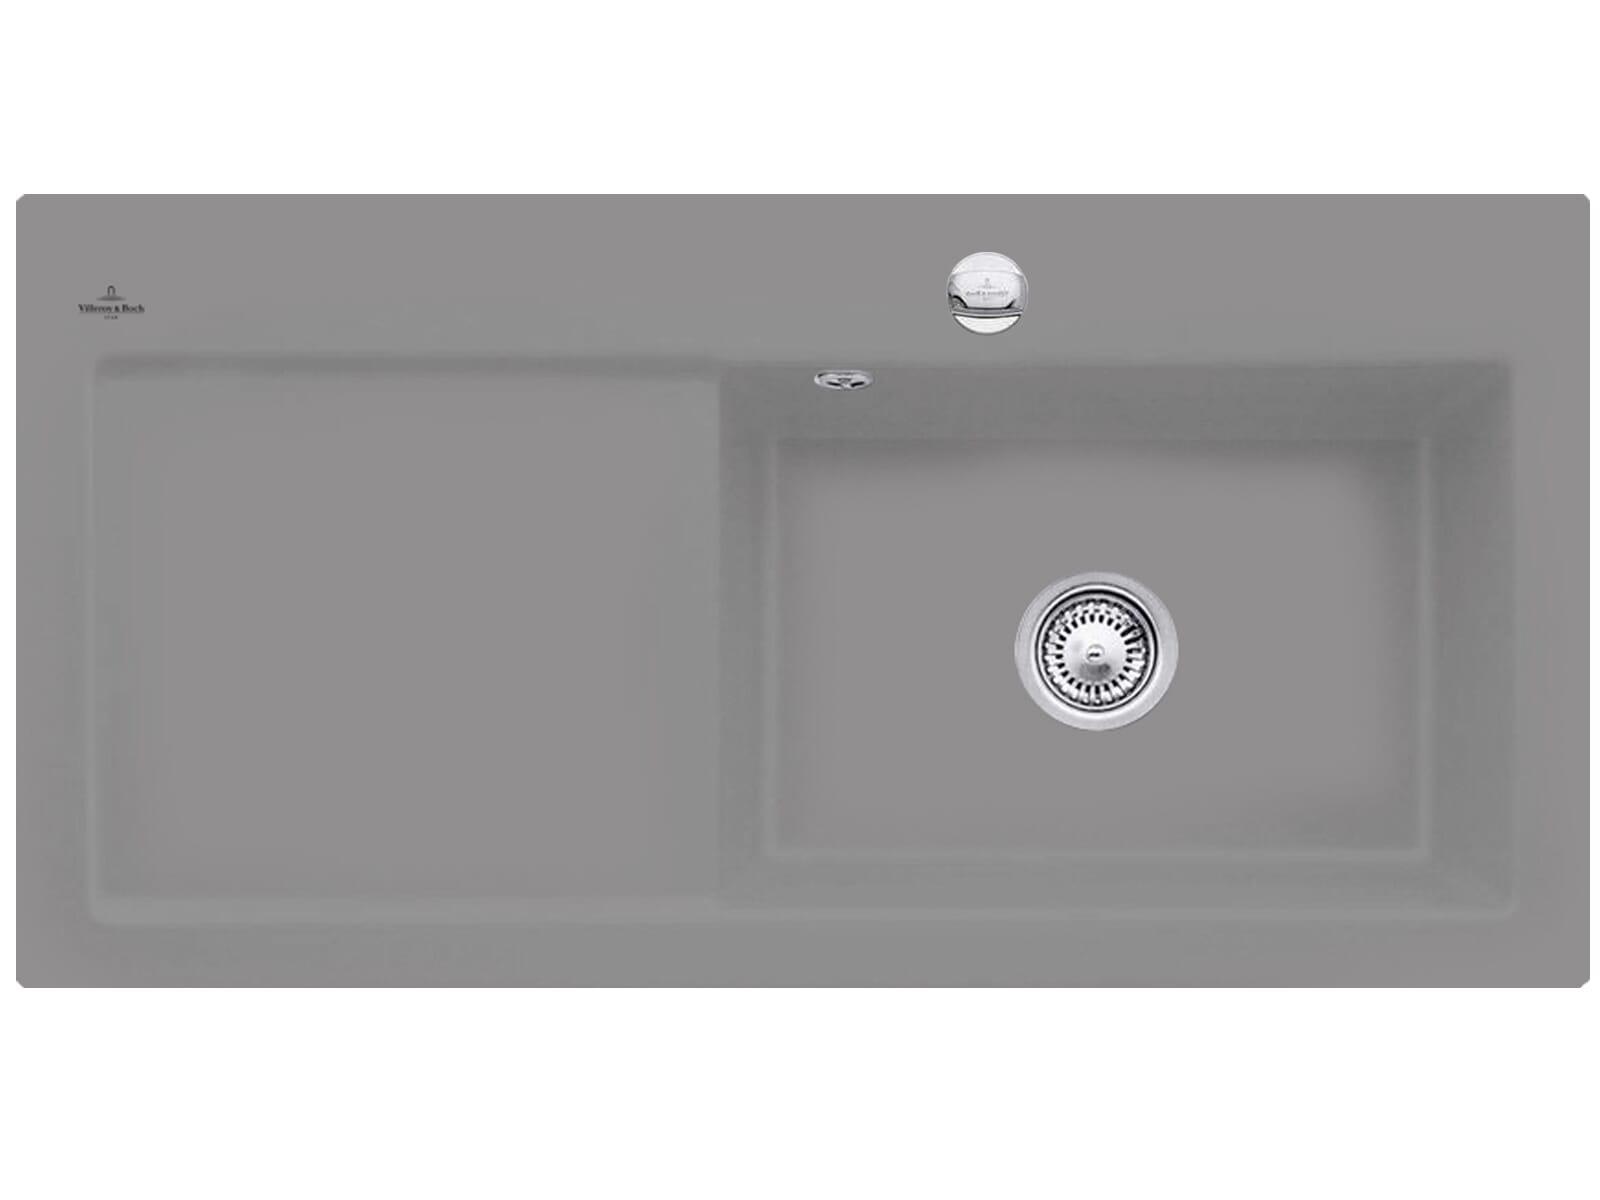 Villeroy & Boch Subway 60 XL Stone - 6719 02 SL Keramikspüle Exzenterbetätigung